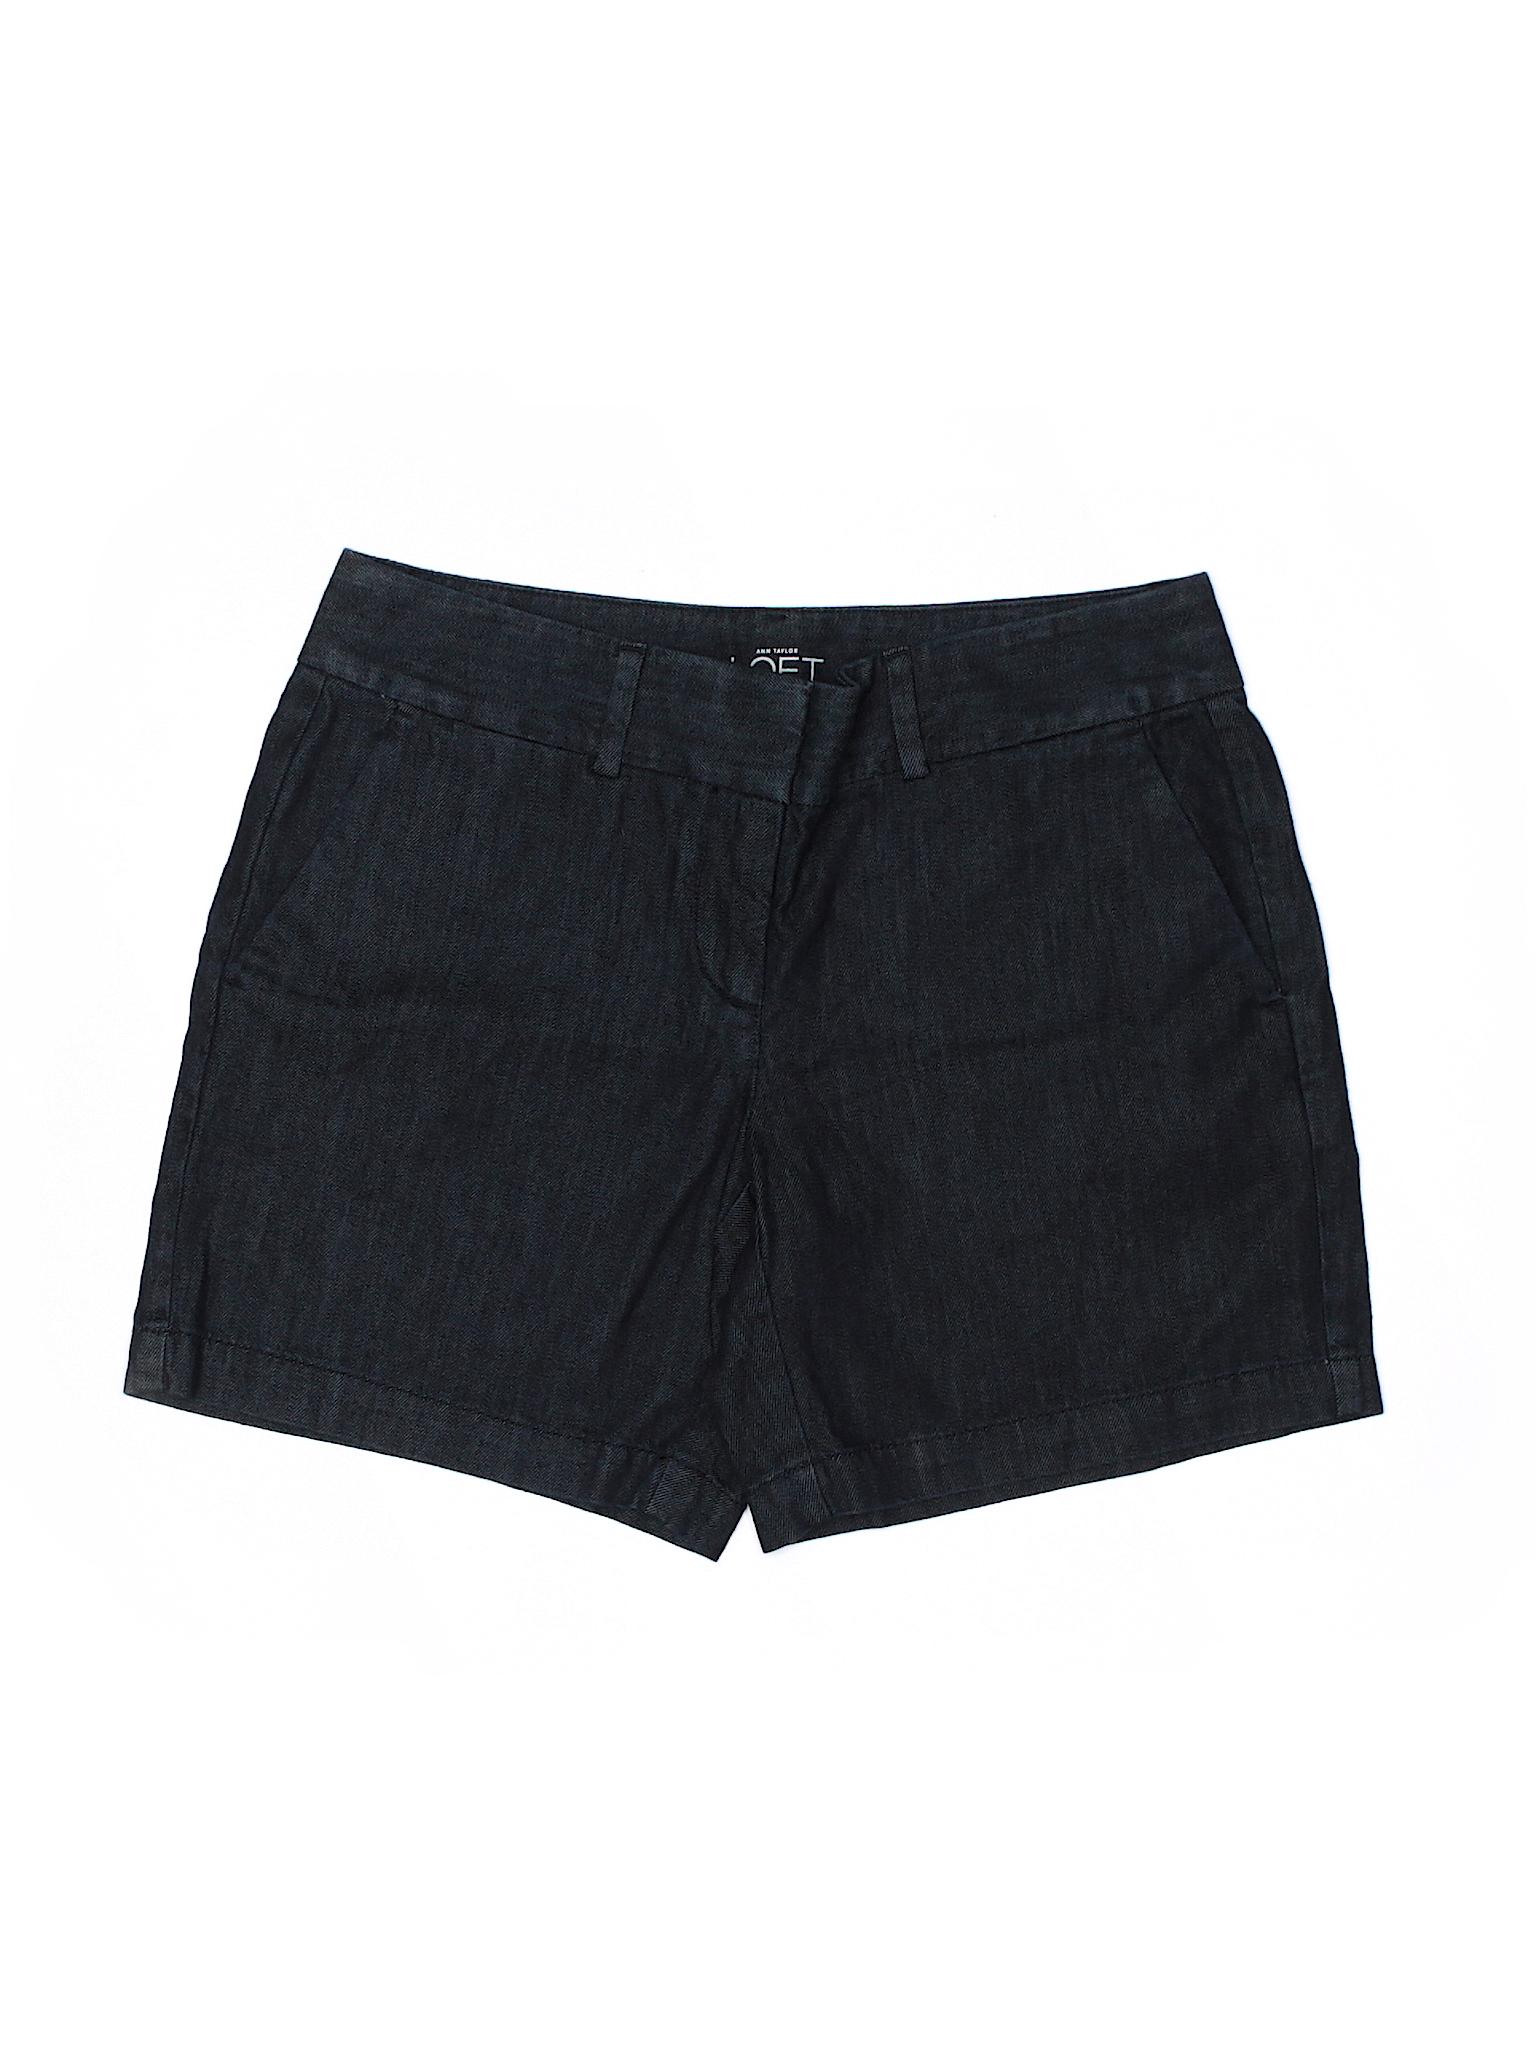 Taylor Boutique Denim Ann LOFT Shorts pq6XF